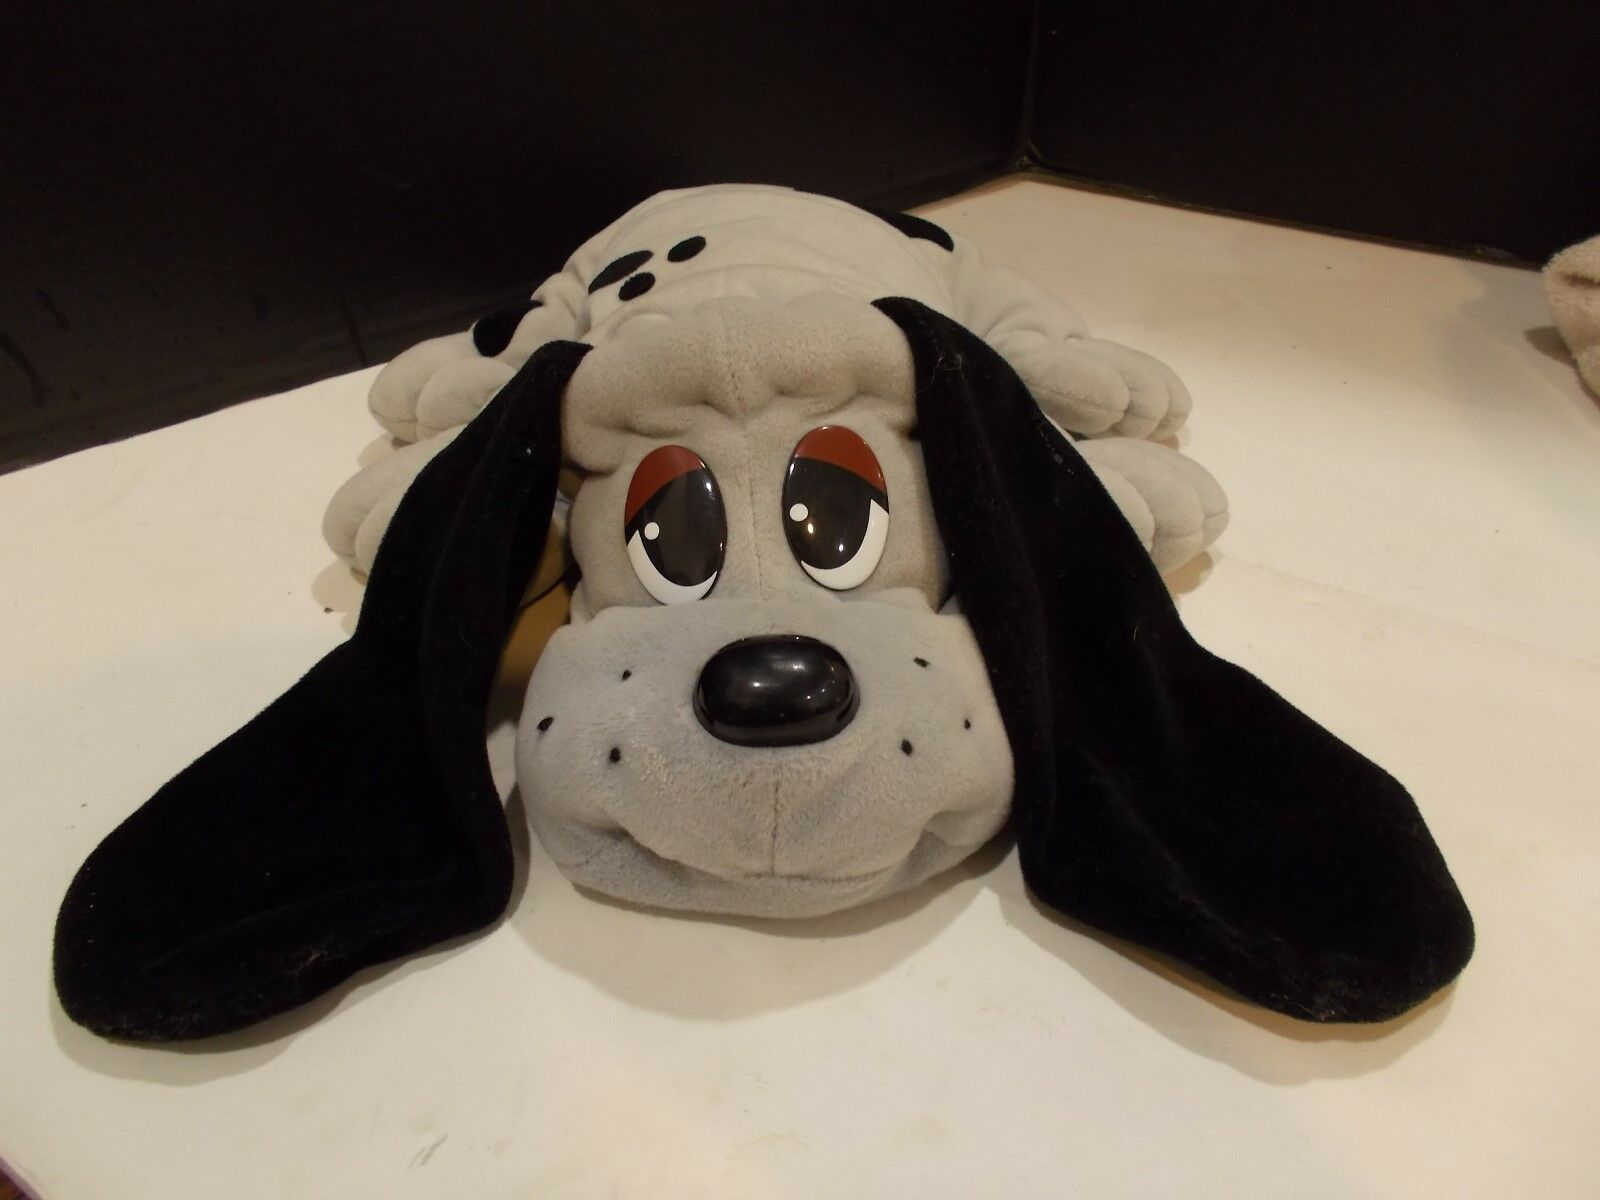 Pound Puppies Stuffed Animals Toys & Hobbies